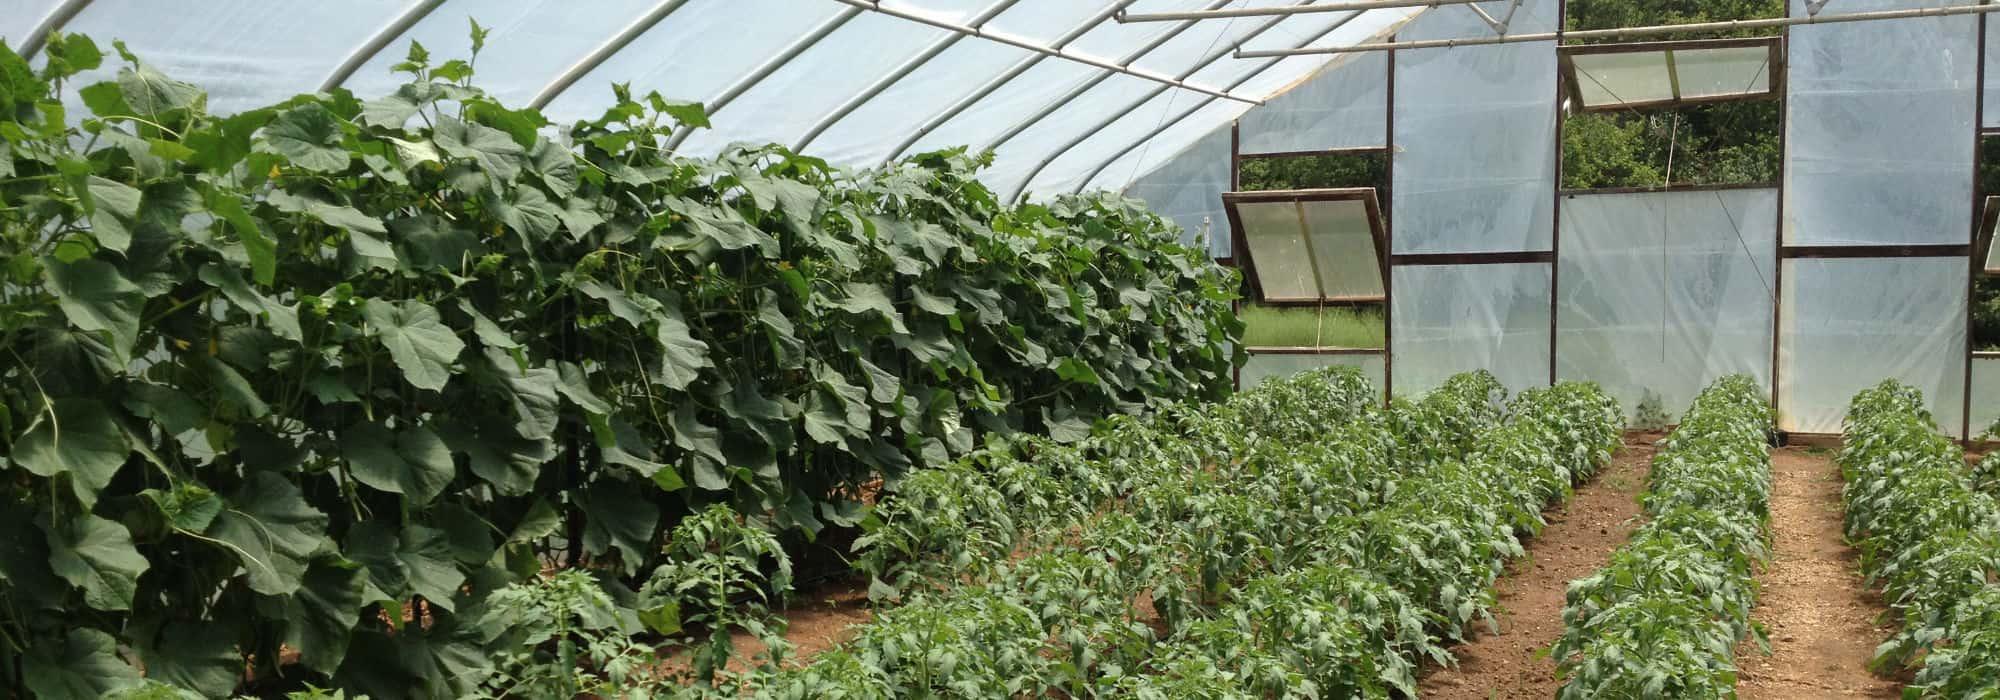 Homepage Slider Greenhouse